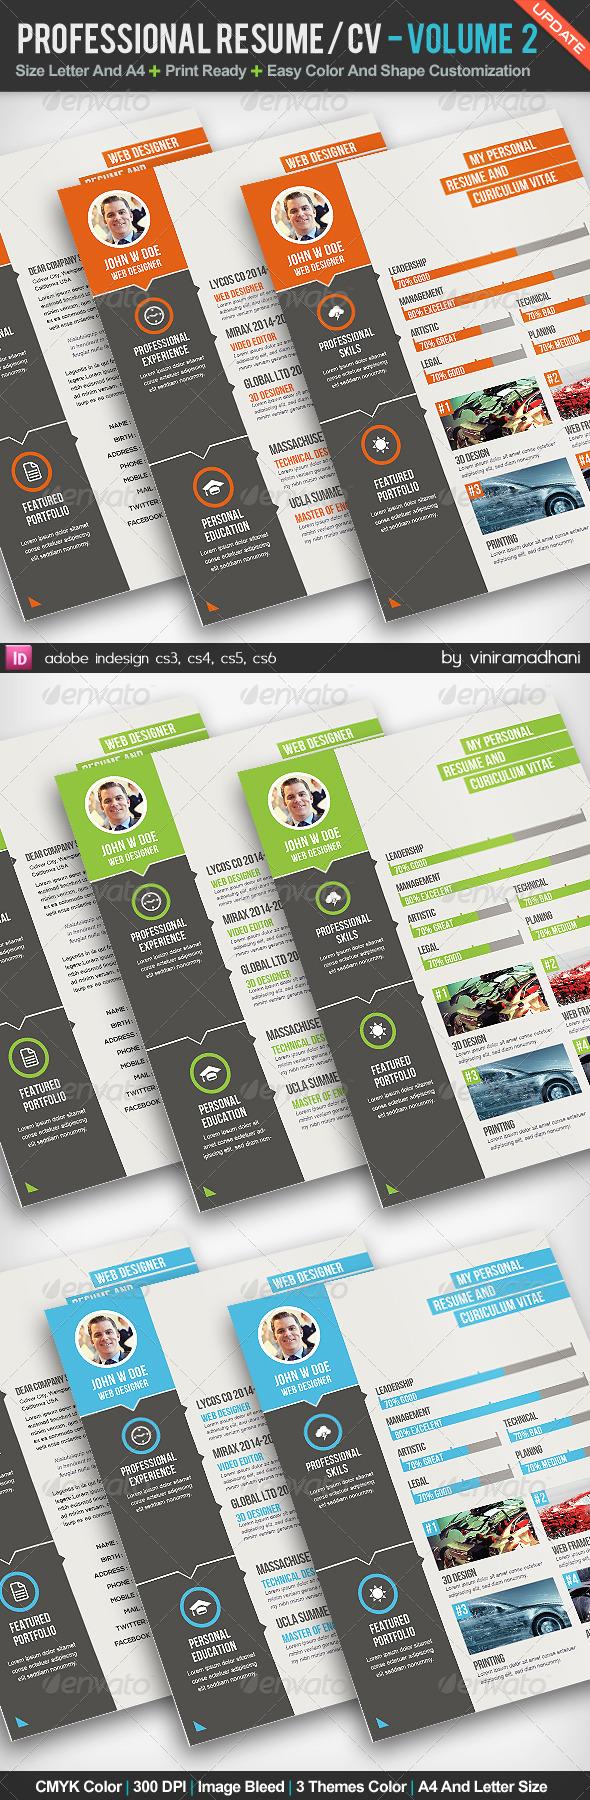 GraphicRiver Professional Resume CV Volume 2 5196376